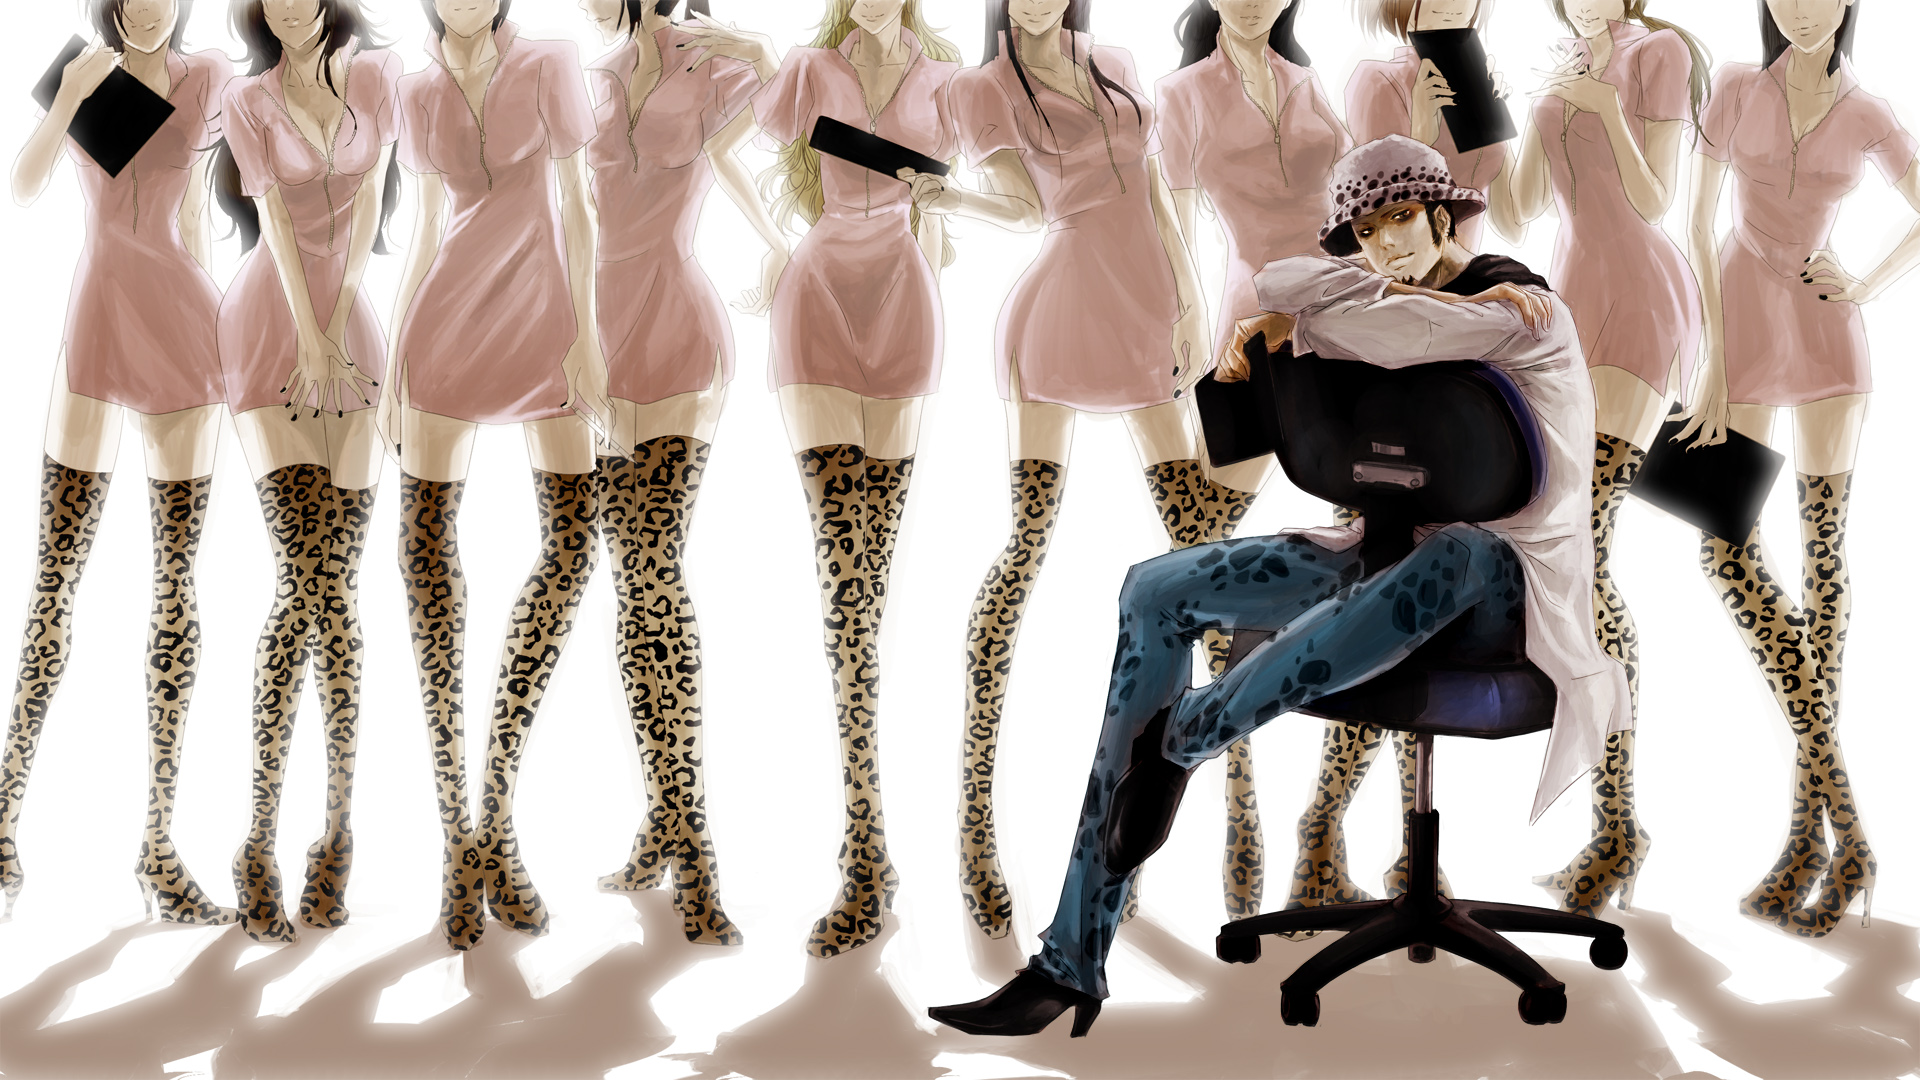 One Piece wallpaper 18